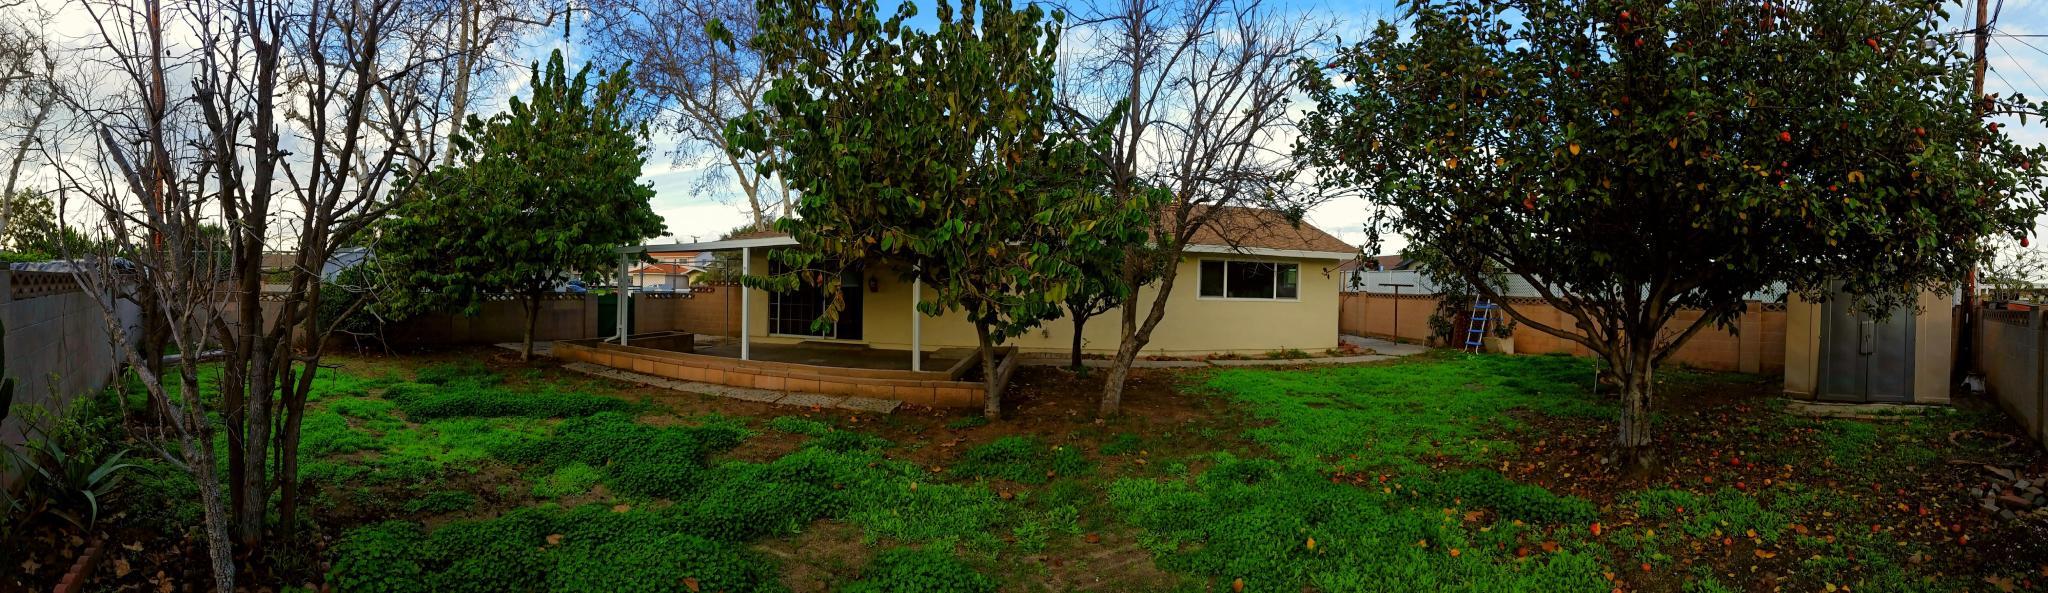 9612 Mansor Ave, Garden Grove, CA 92844 For Rent | Trulia